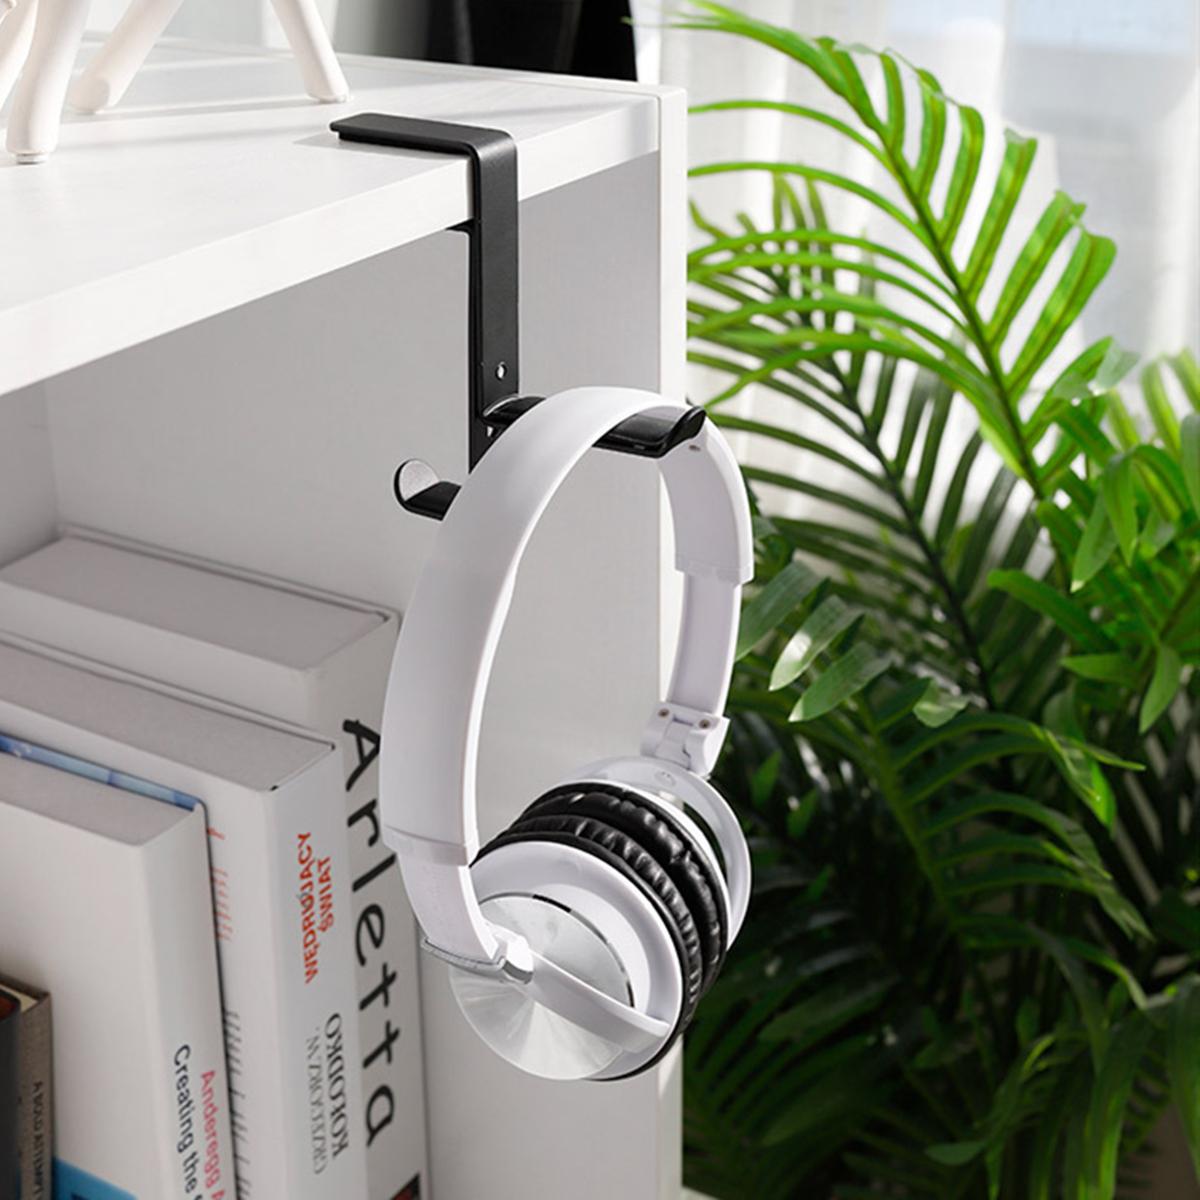 Steel Headset Earphone Headphone Hanger Stand Holder Table Clamp Clip Screws Headset Holder